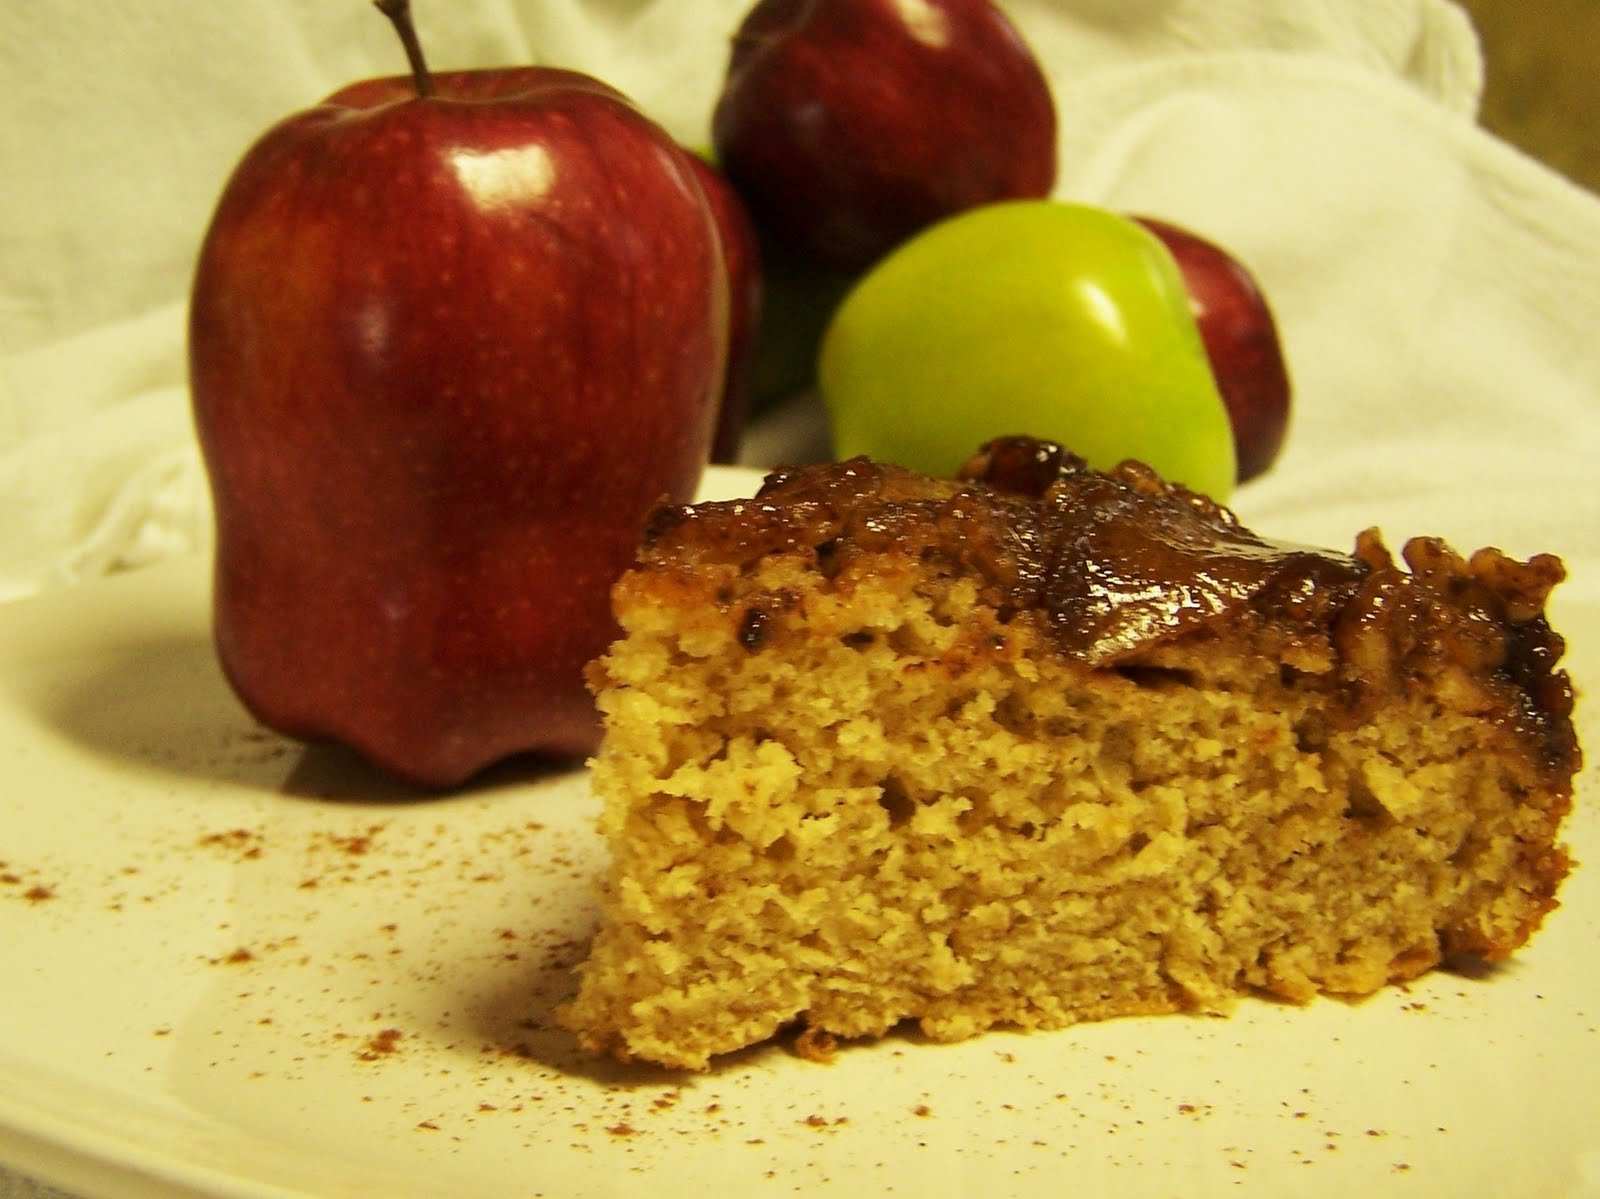 Upside Down Apple Cake With Pancake Mix